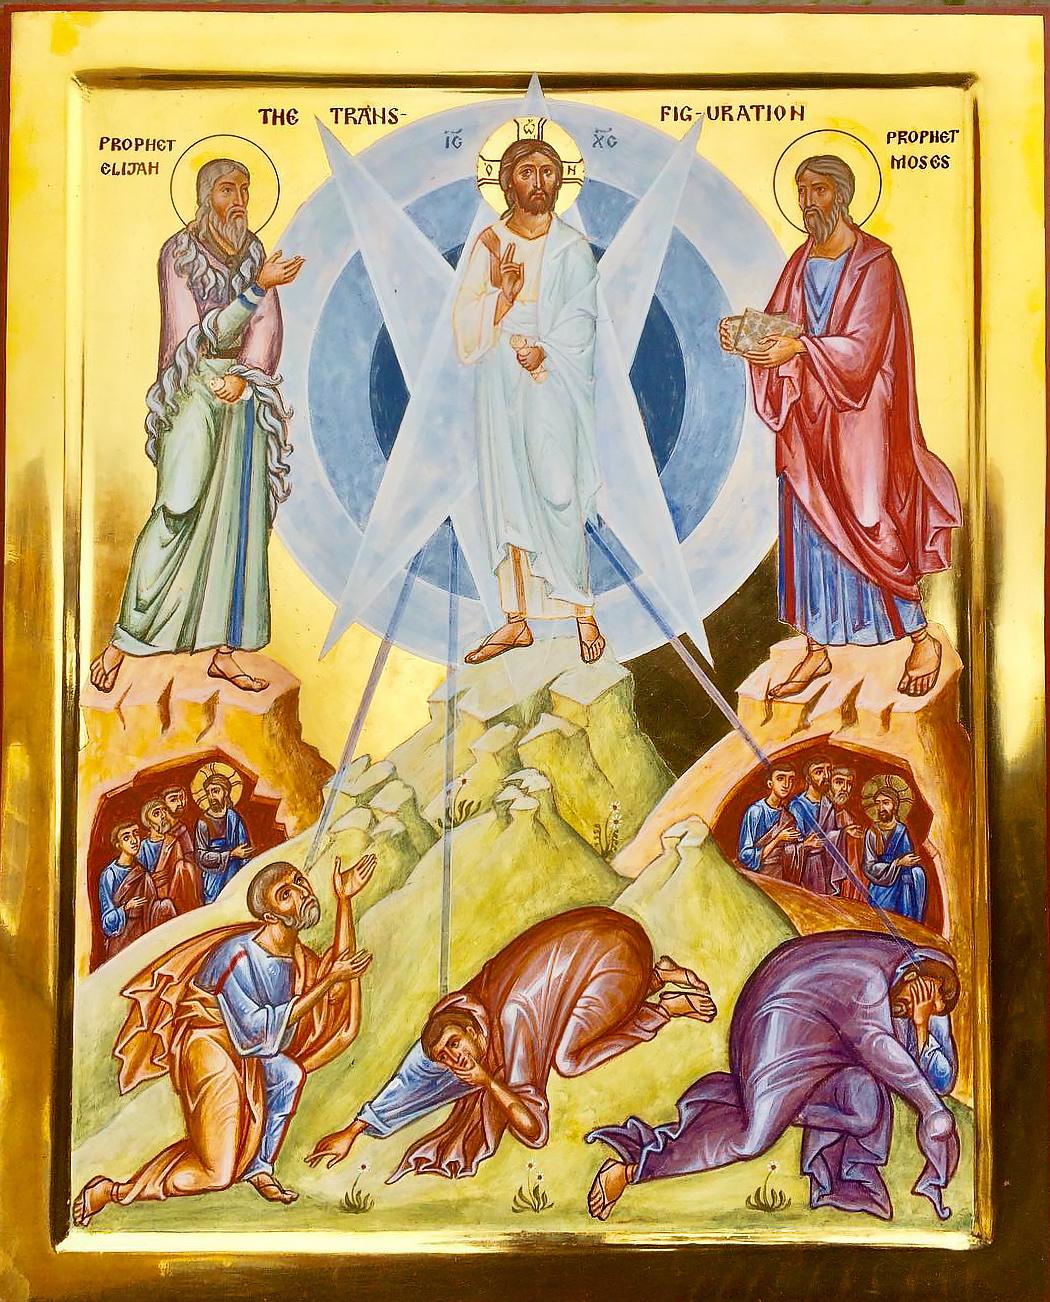 Transfiguration of our Lord and Savior Jesus Christ